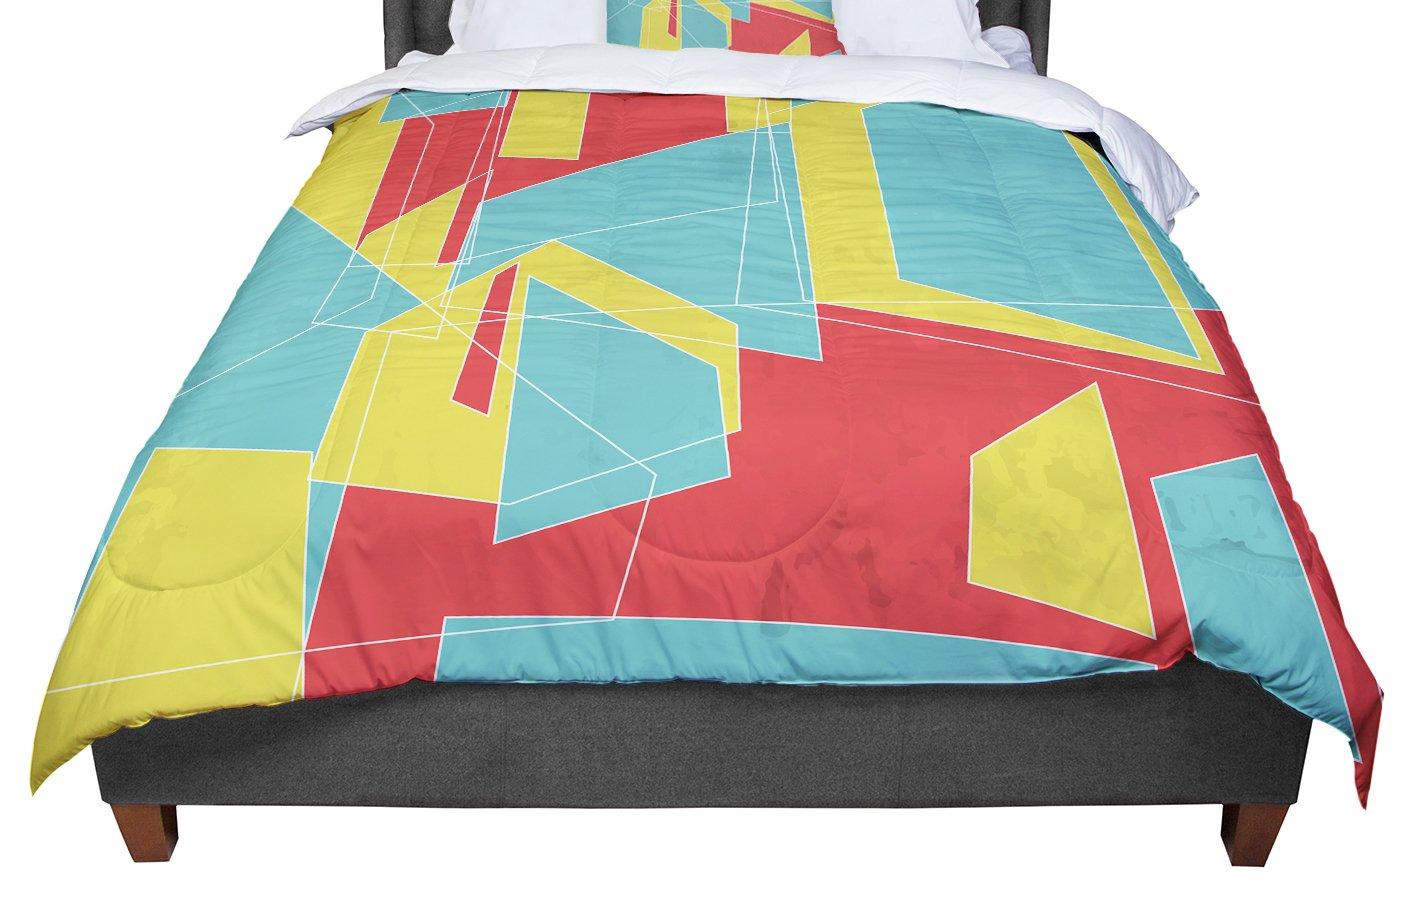 104 X 88 Cal King Comforter KESS InHouse MaJoBV Cartagena Balconies Teal Red Yellow King